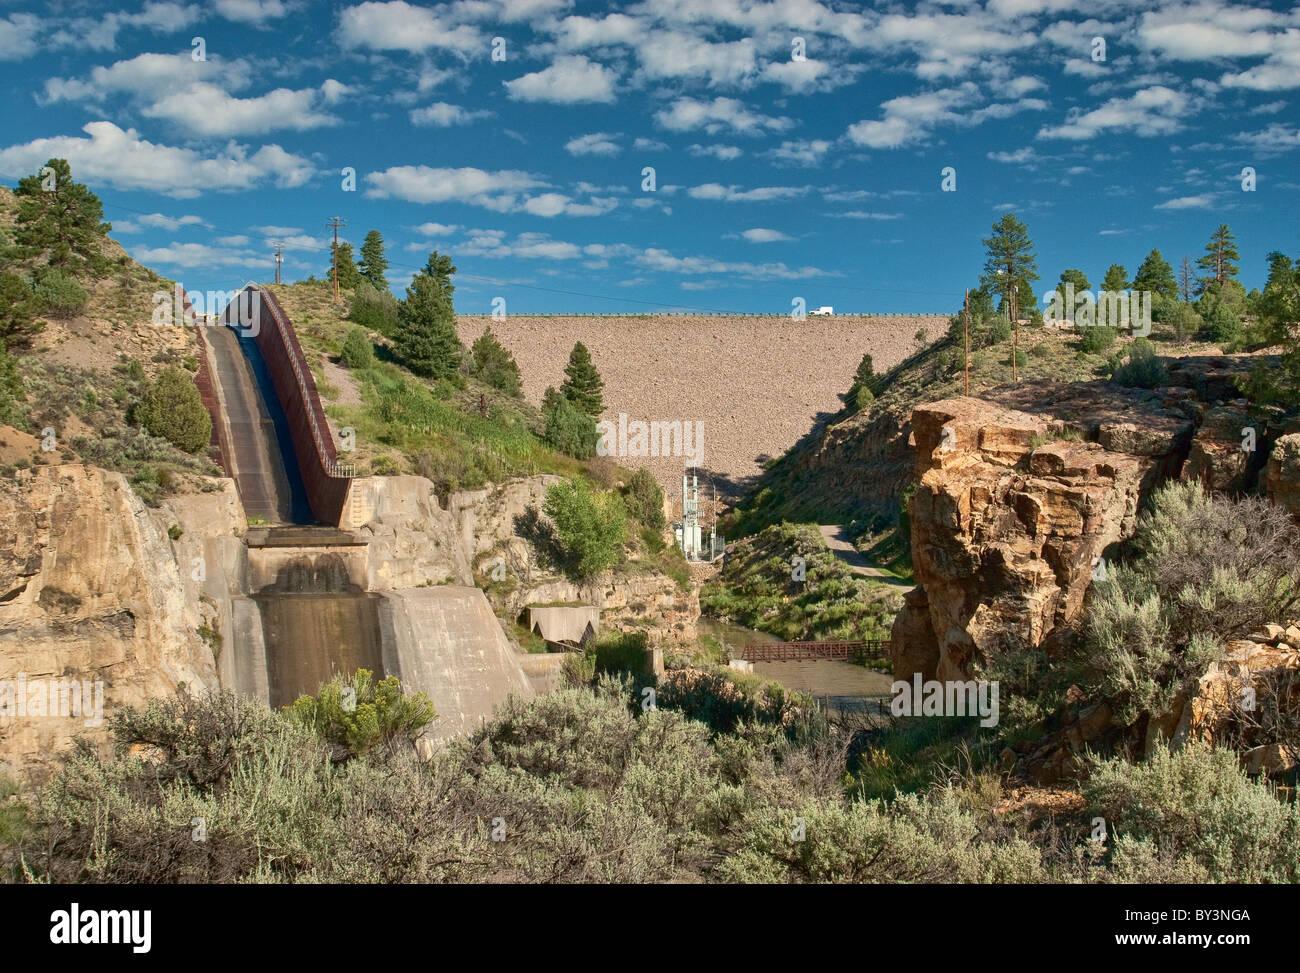 Spillway at El Vado Dam on Rio Chama near Tierra Amarilla, New Mexico, USA Stock Photo